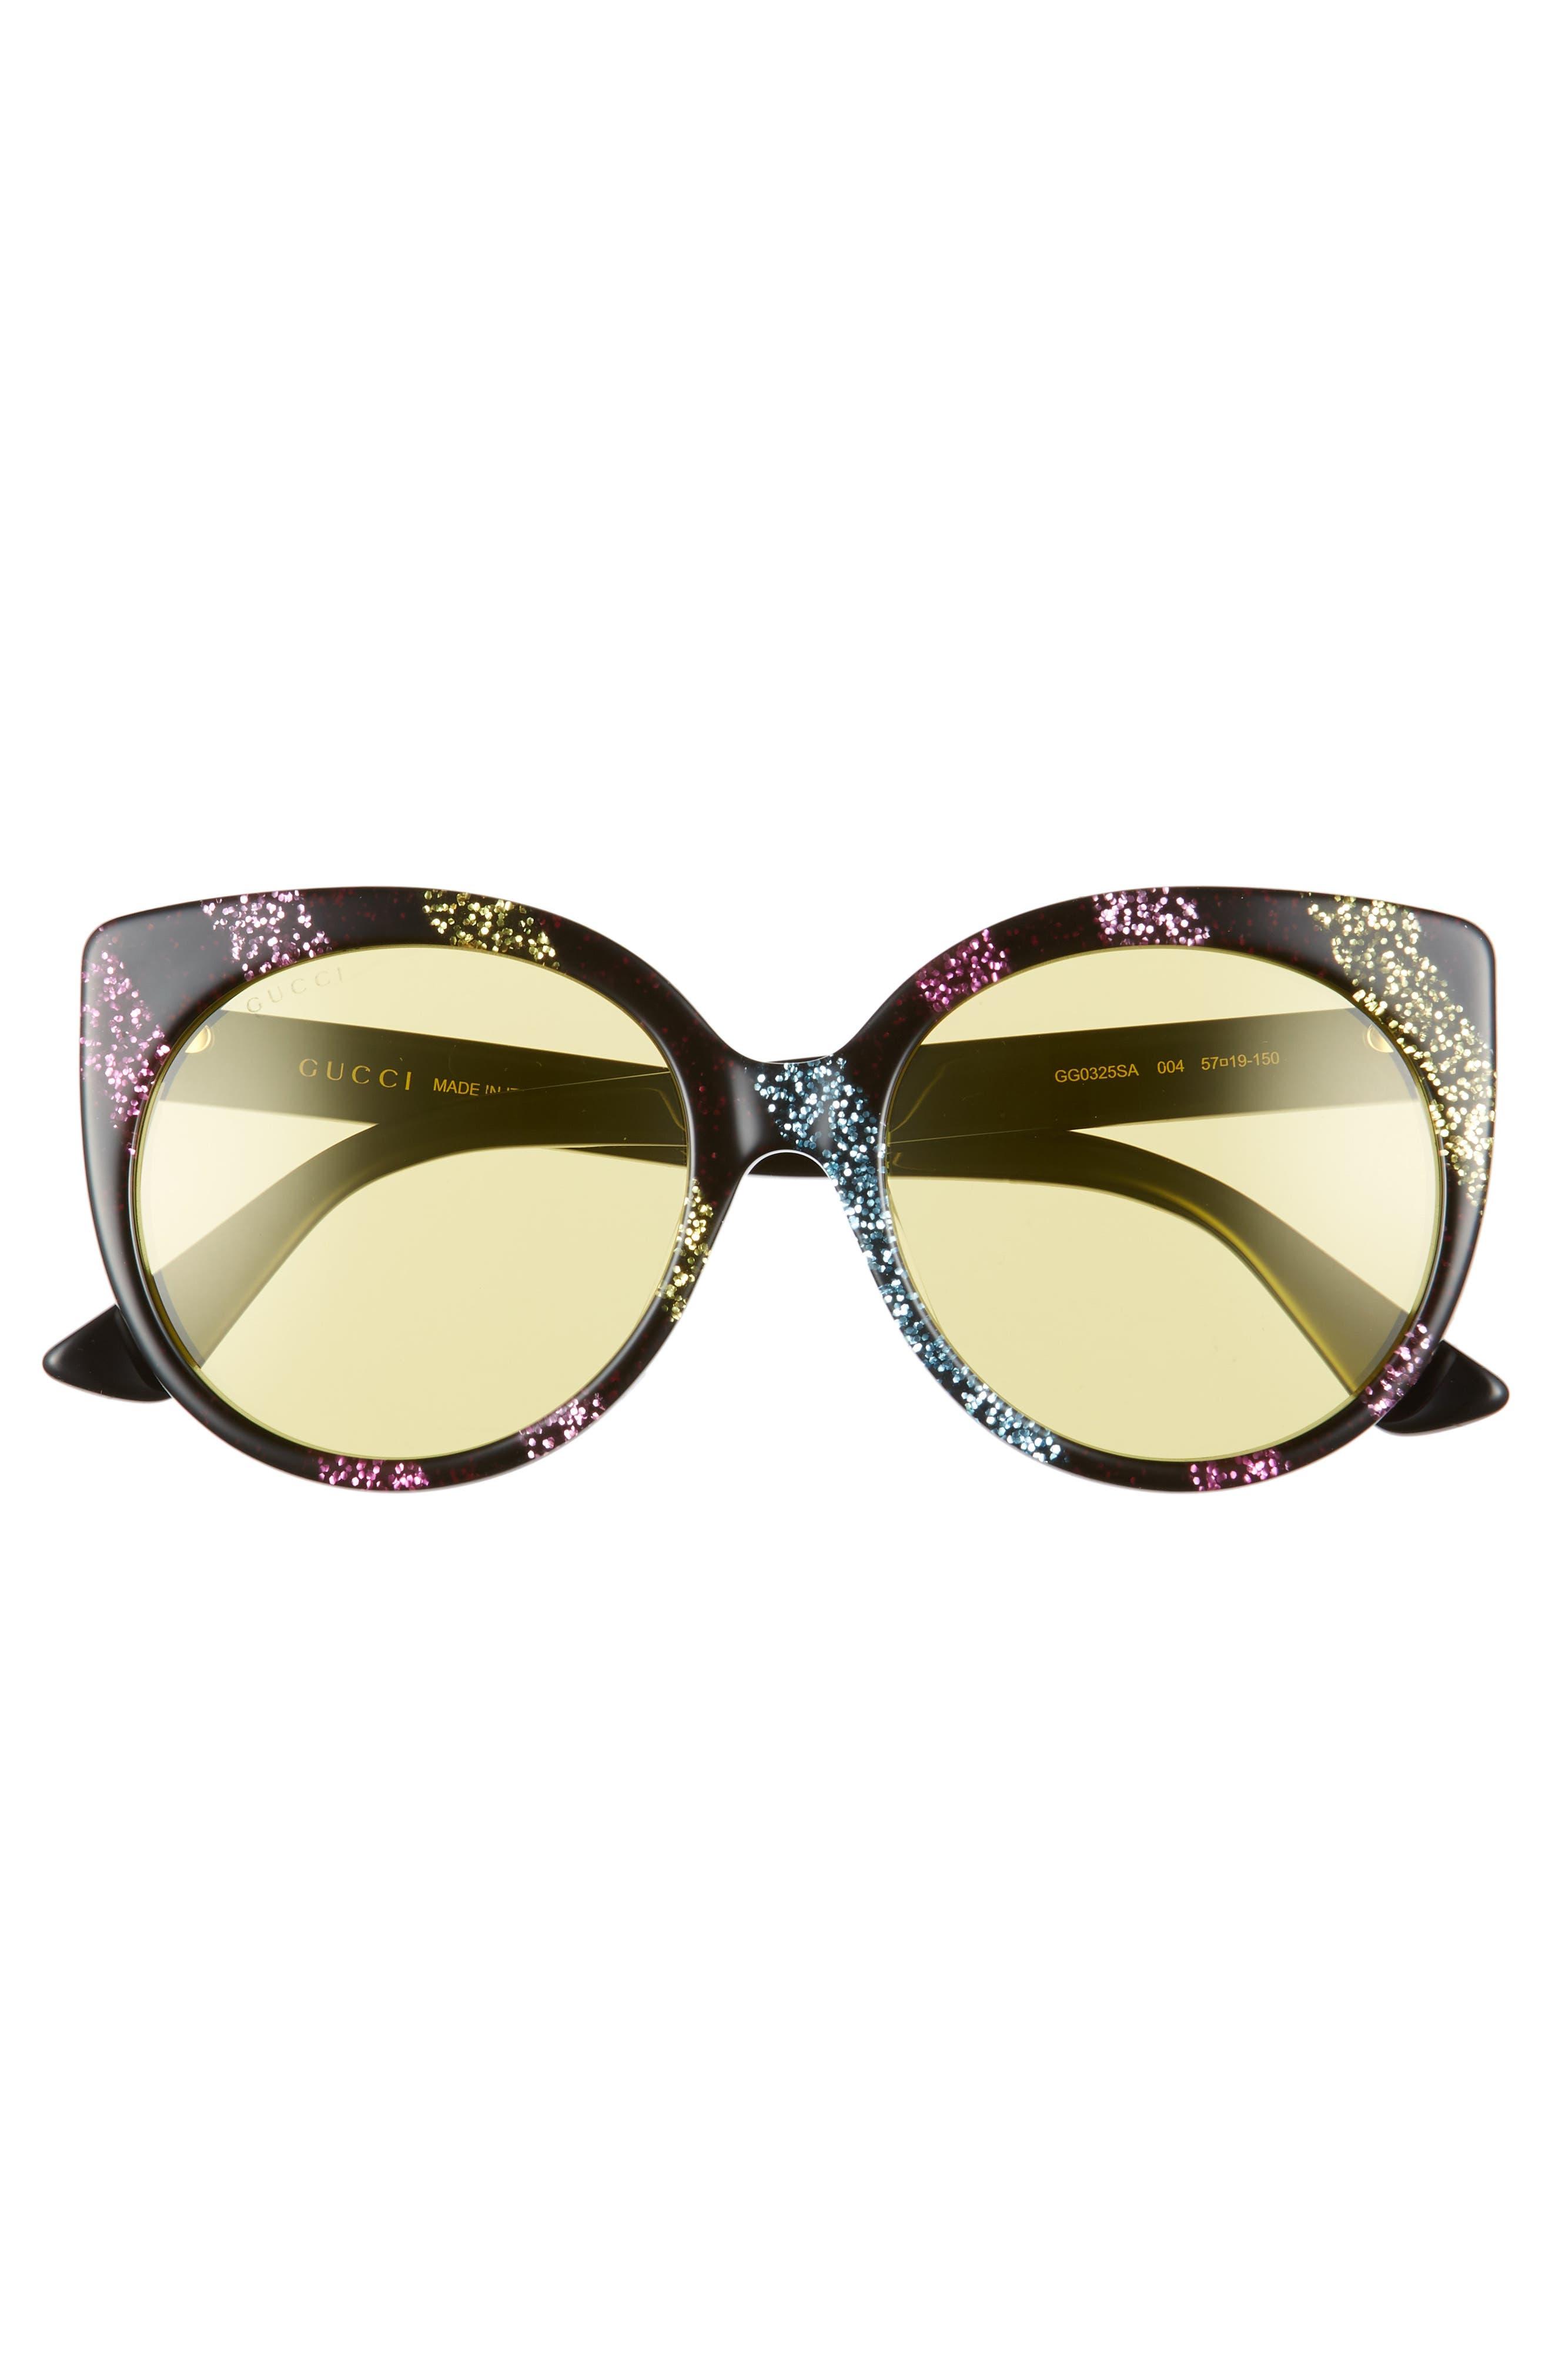 57mm Cat Eye Sunglasses,                             Alternate thumbnail 3, color,                             Pink/ Multicolor